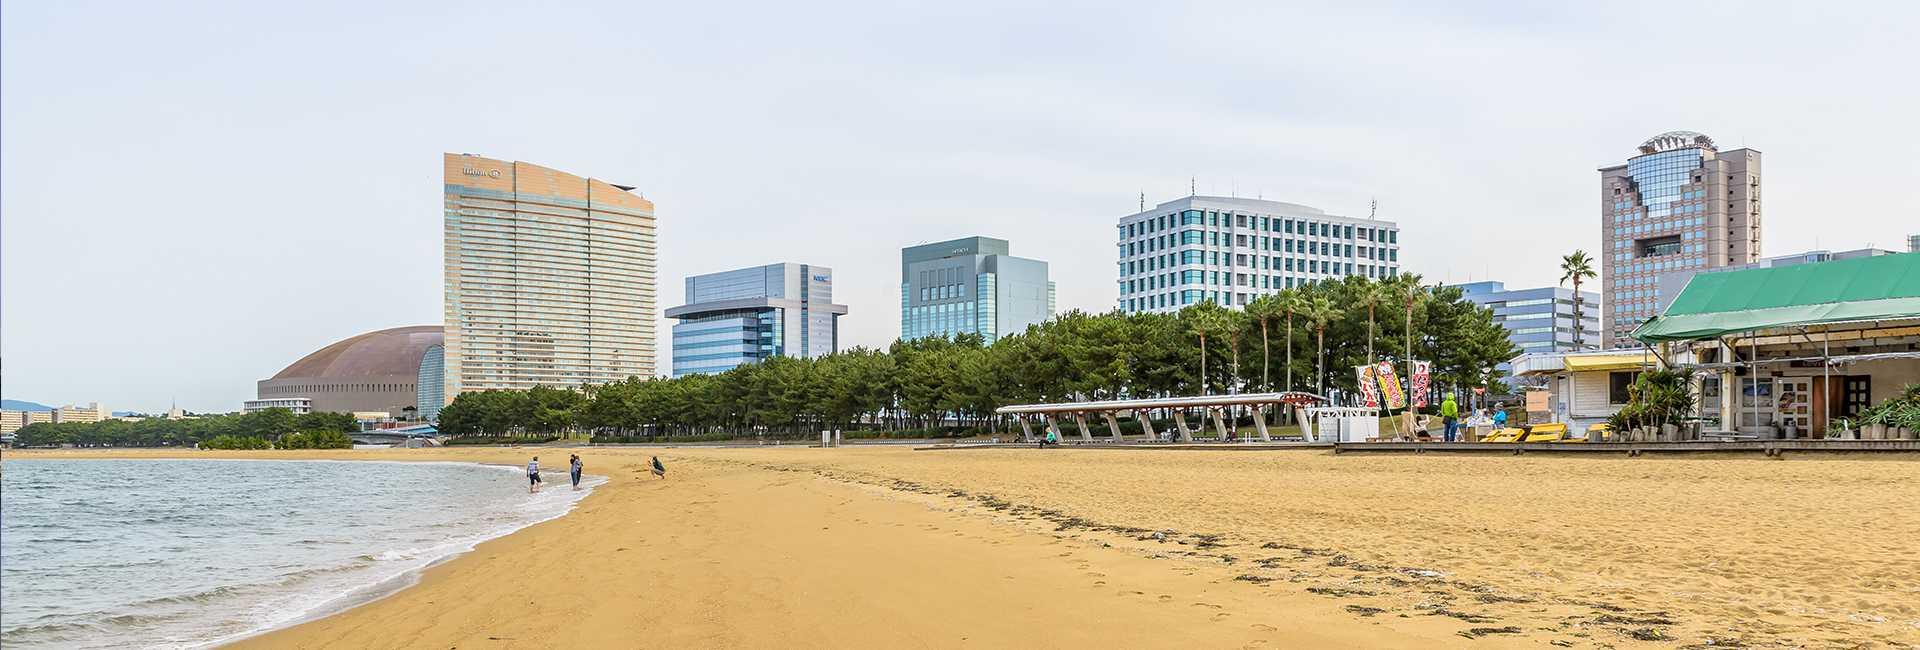 a beach in Fukuoka